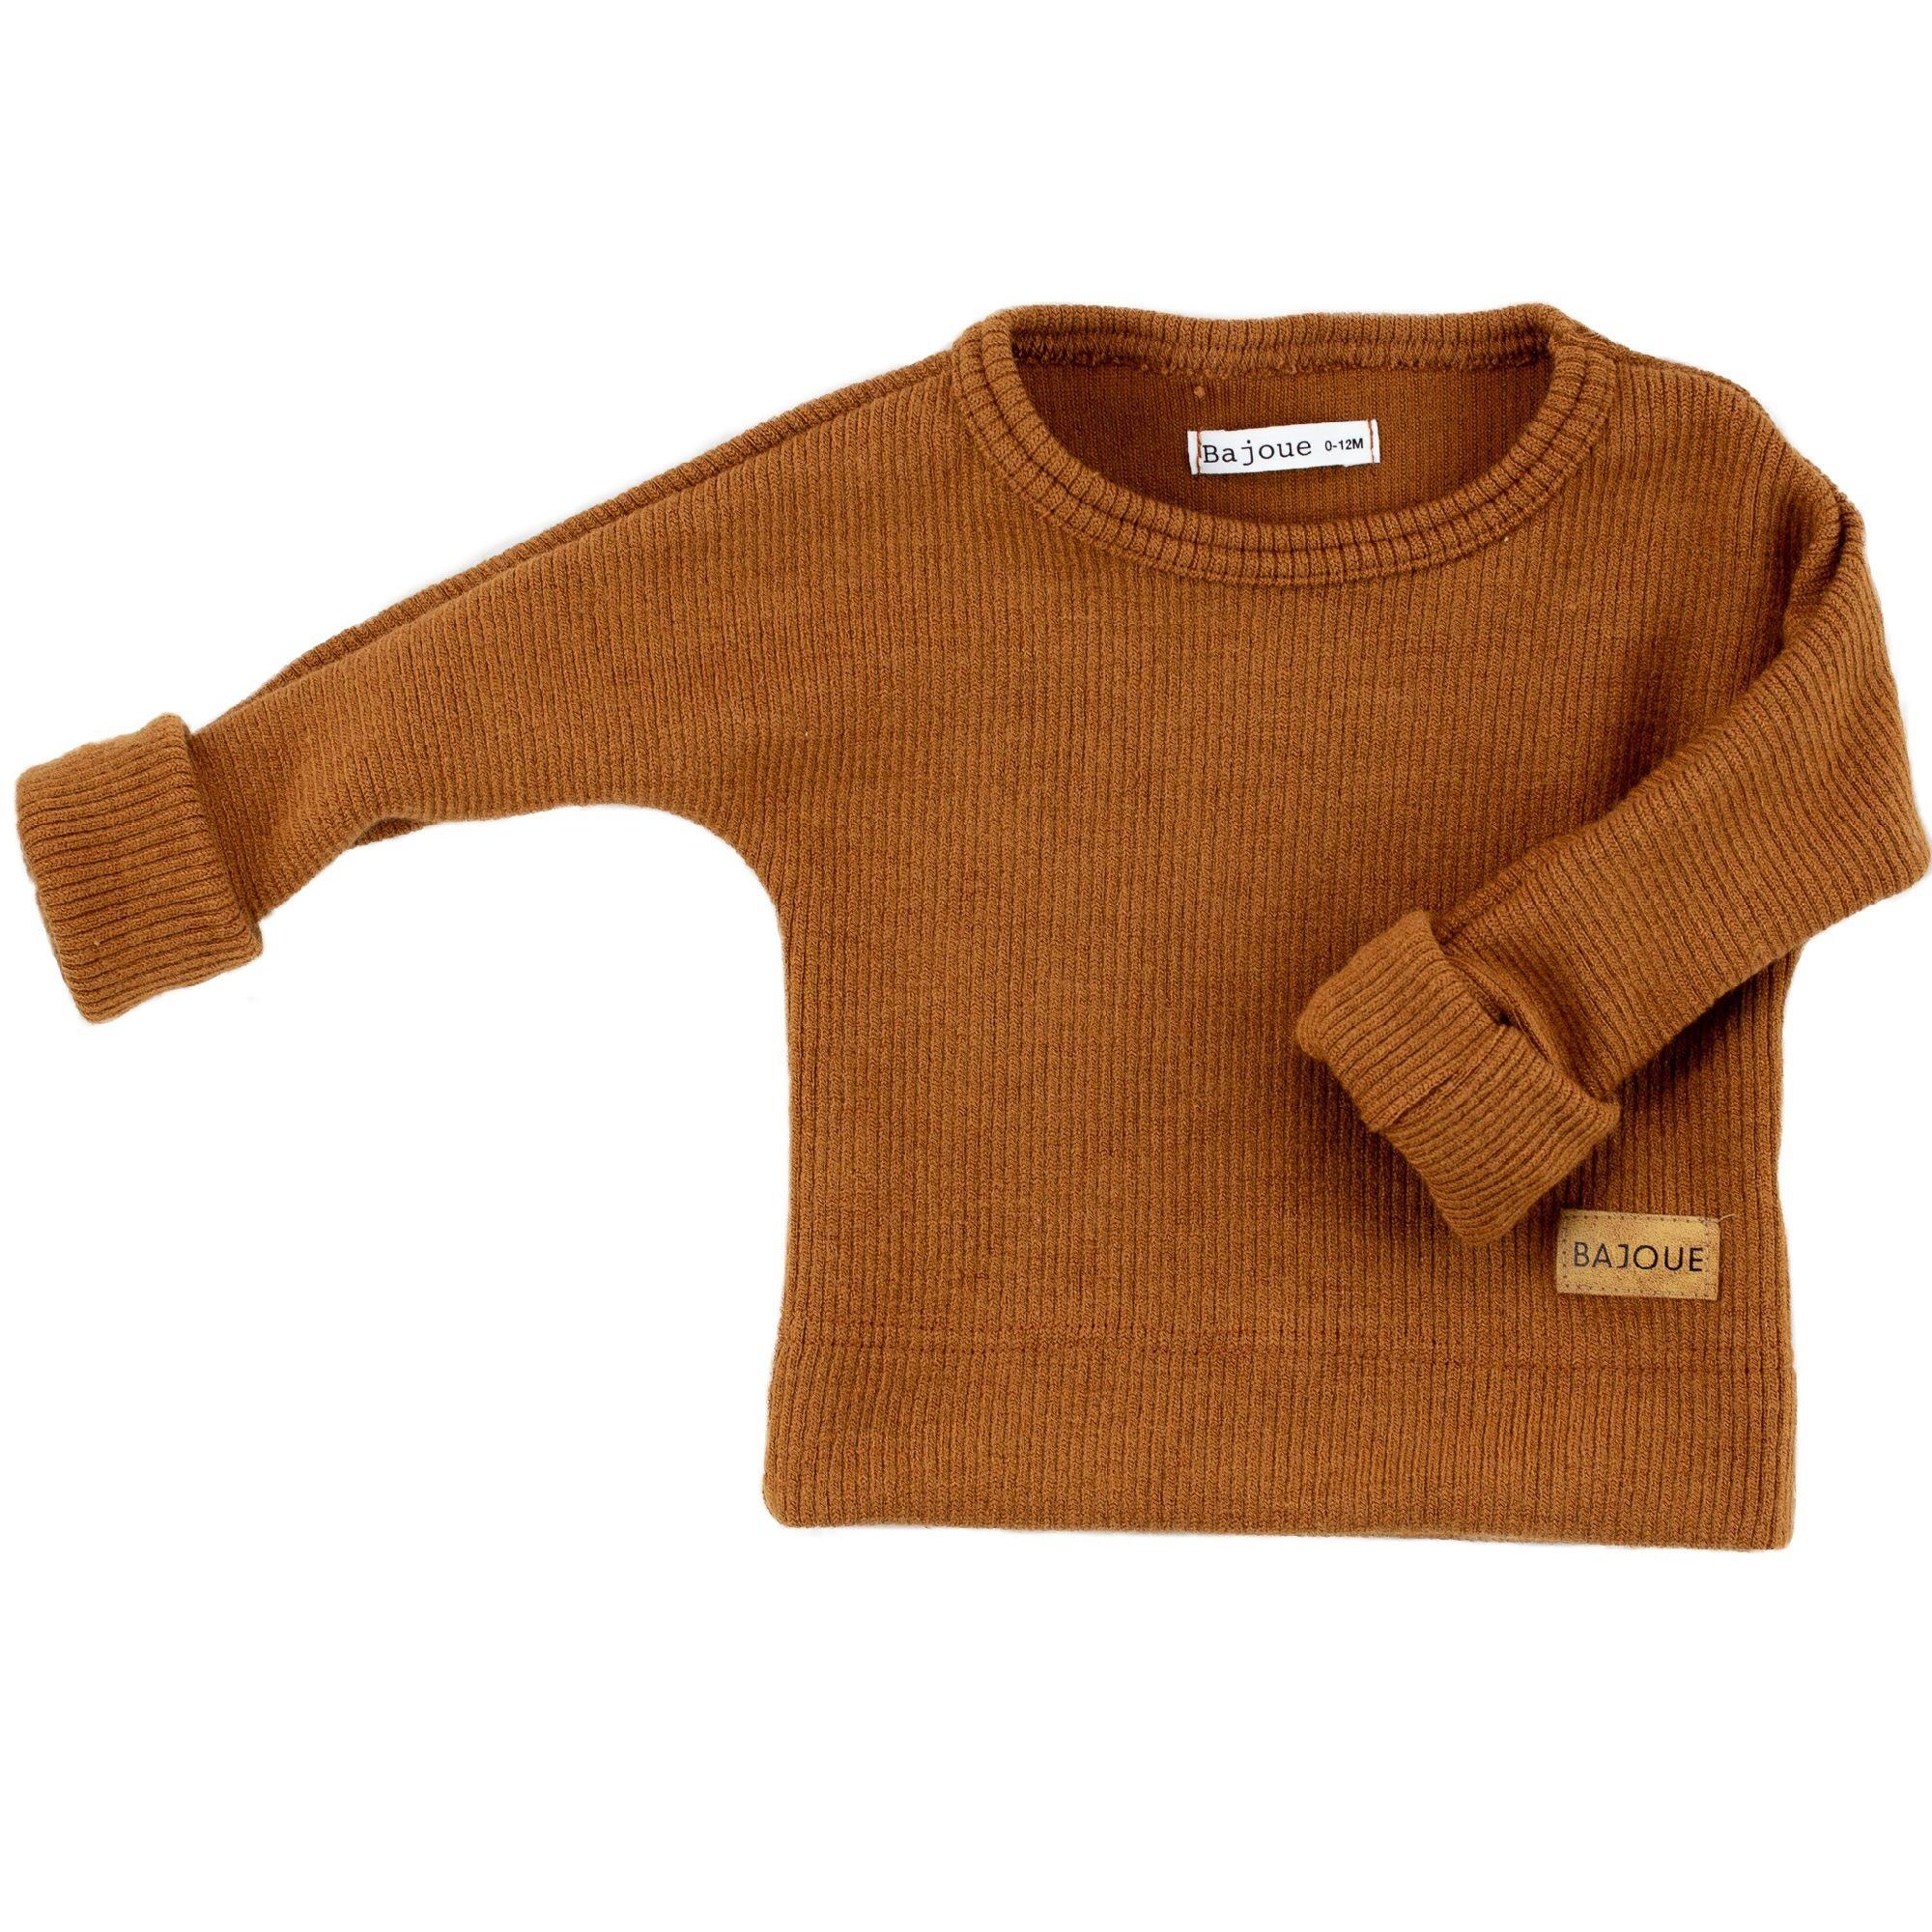 Bajoue Maple Evolutive Sweater